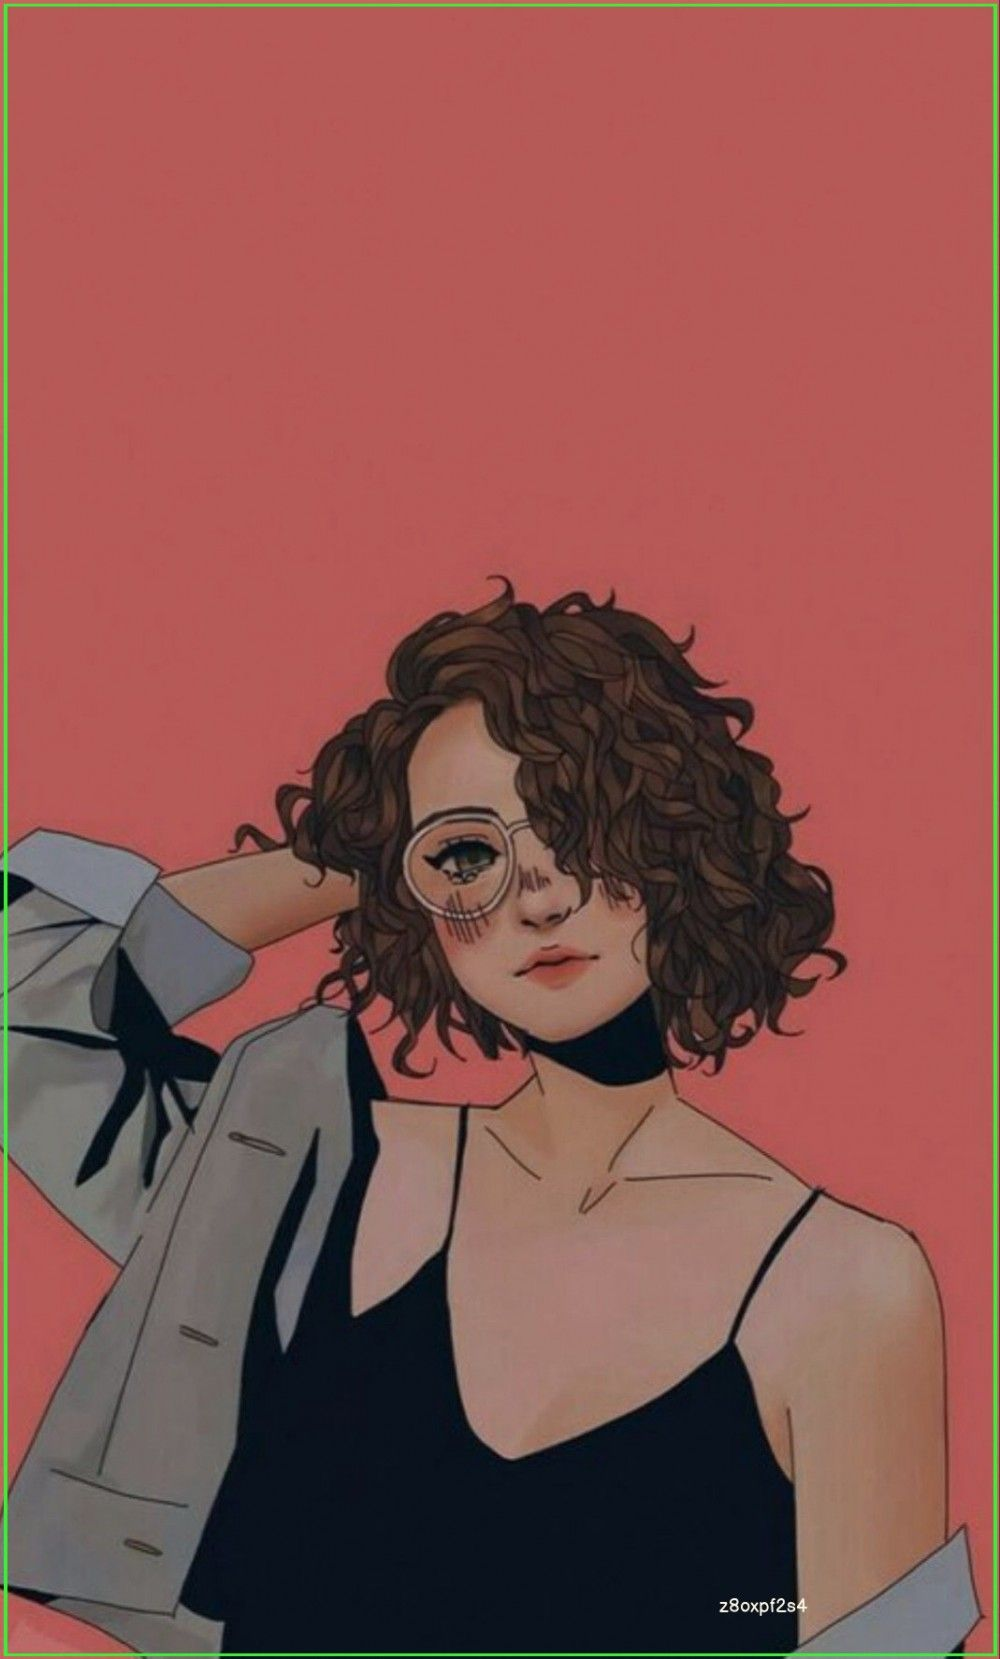 Hd Girly Wallpaper Cute Wallpaper Girl Short Hair Curly Hair Glasses Girl In 2020 Girl Short Hair Digital Art Girl Girly Art